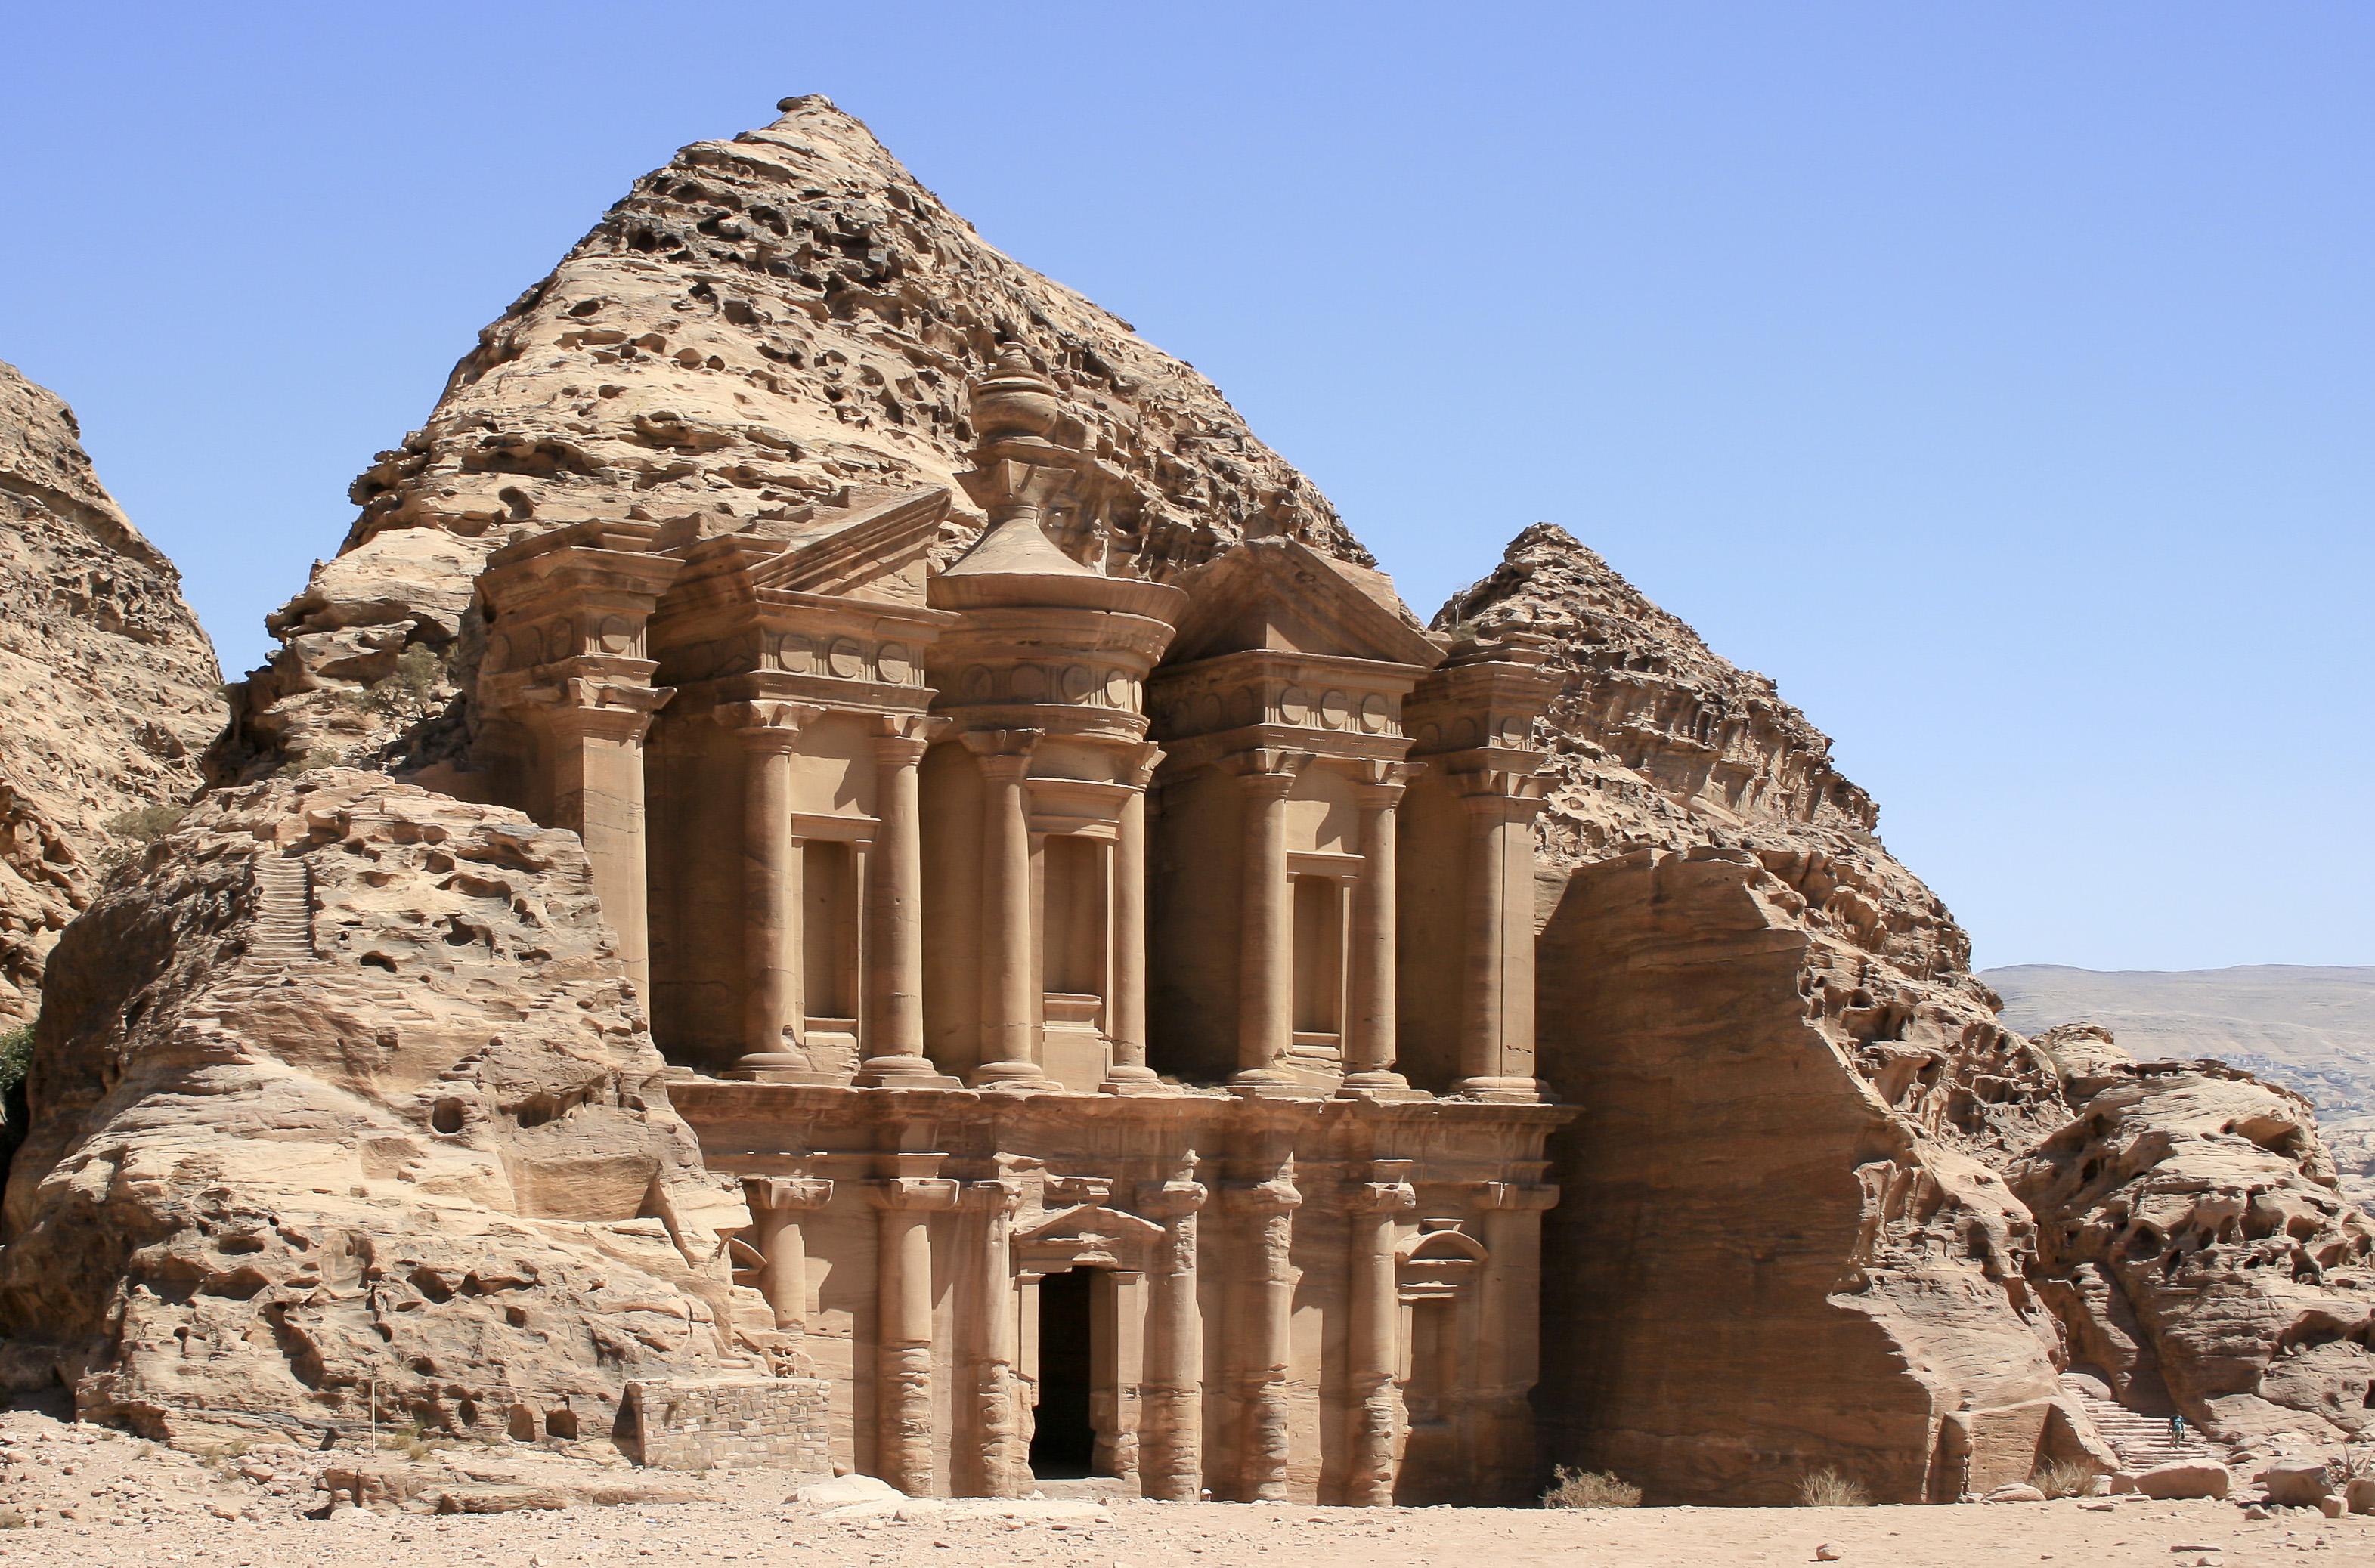 The Petra Monastery